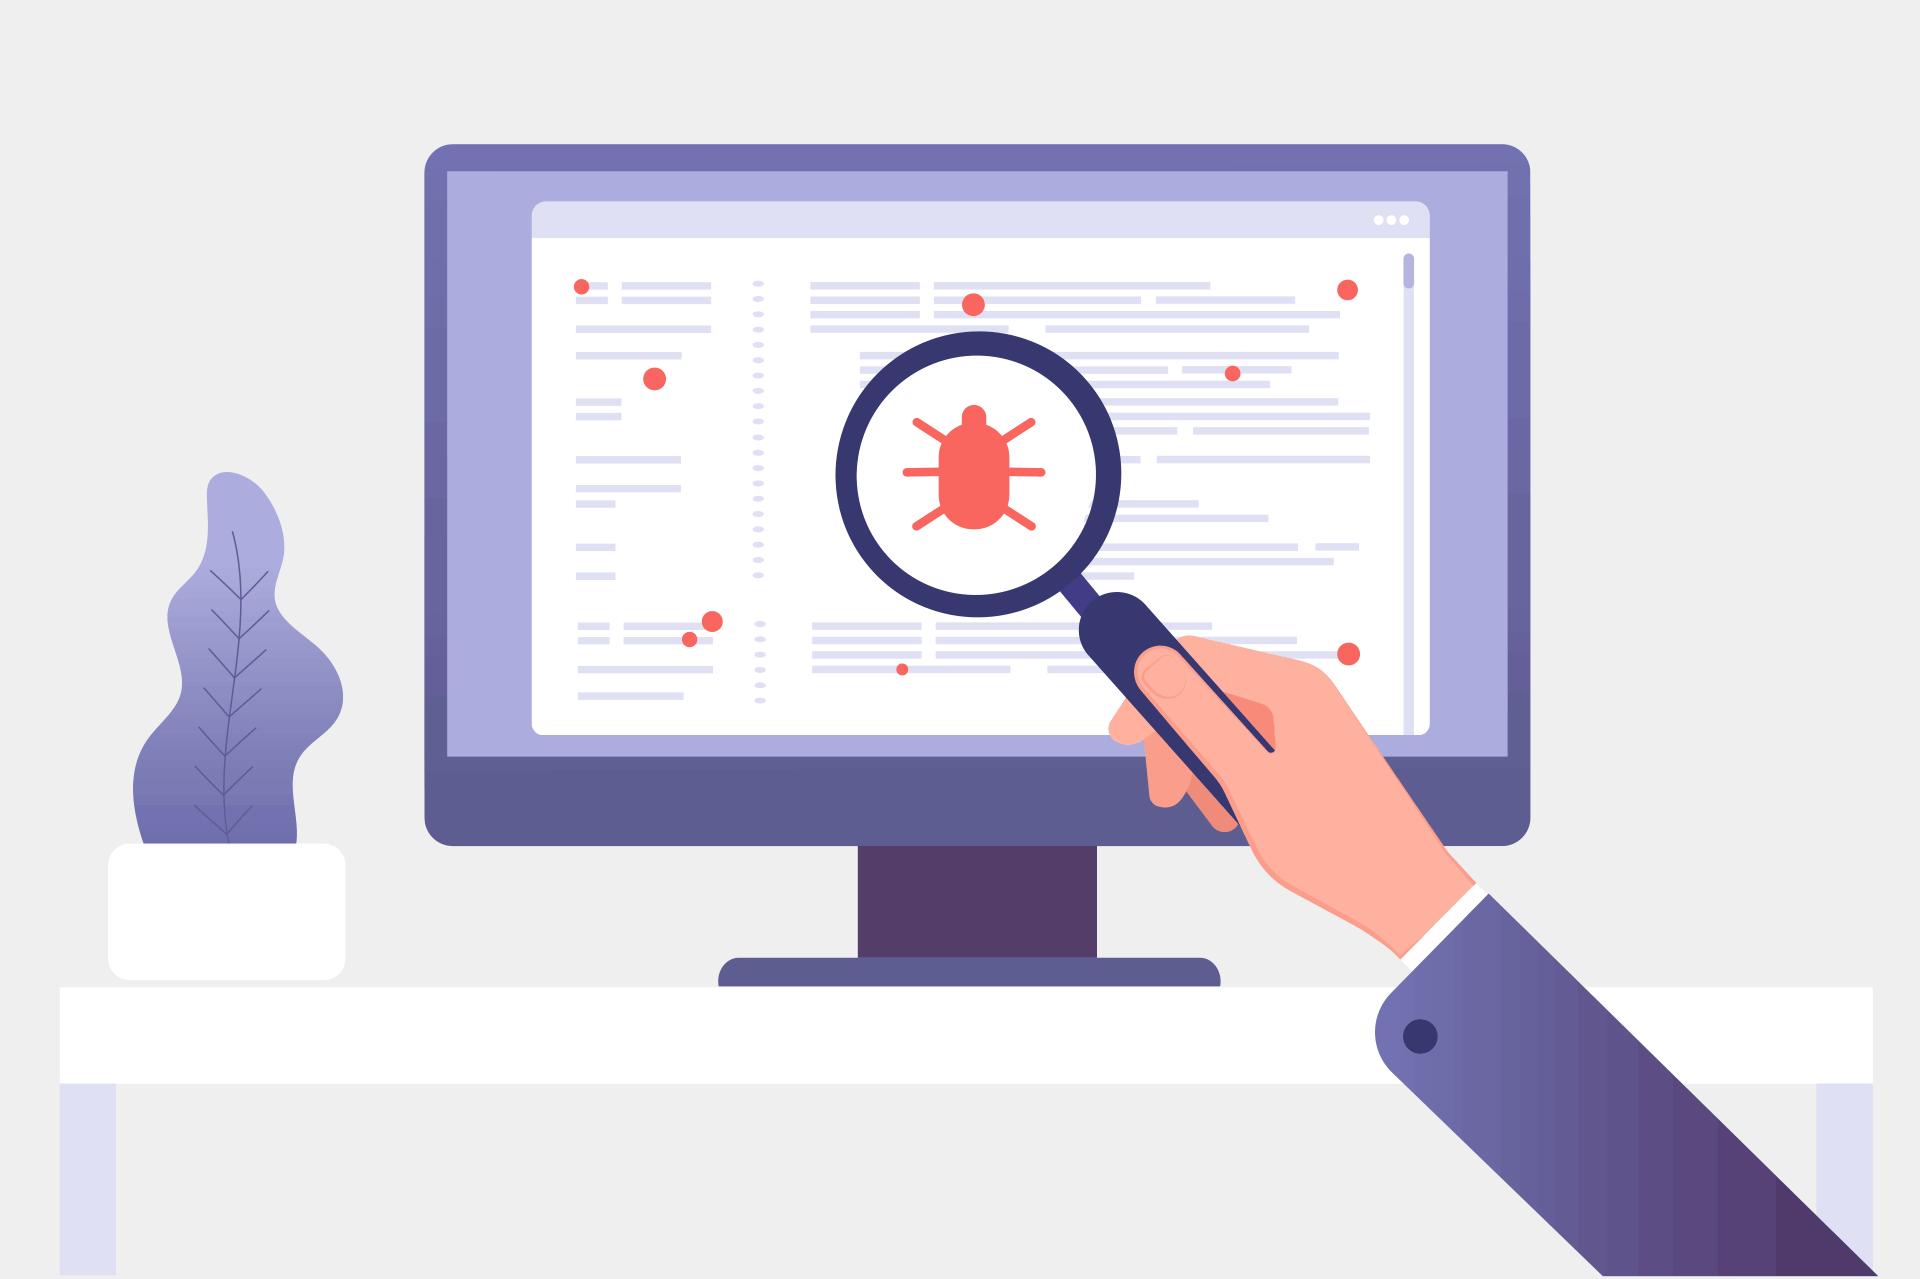 Vulnerability Scanning vs. Penetration Testing